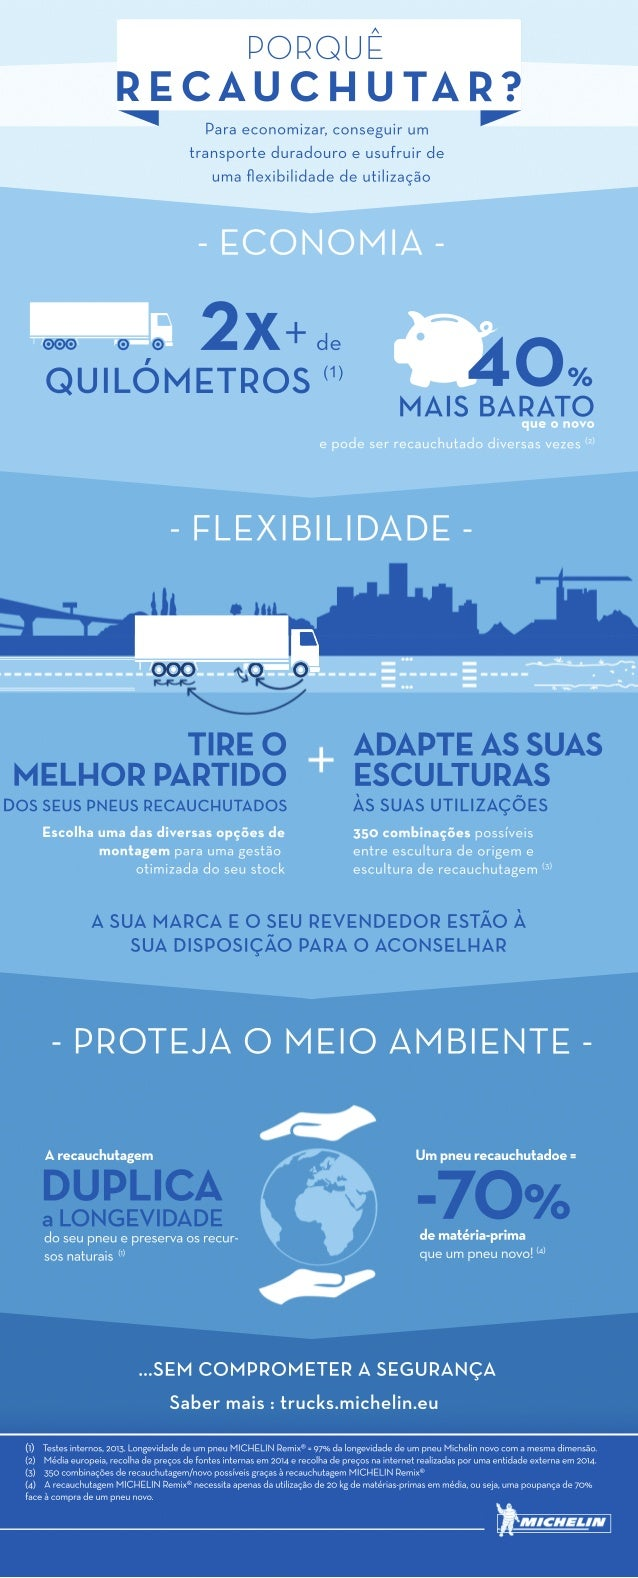 SEMCOMPROMETERASEGURANÇA Sabermais:trucks.michelin.eu epodeserrecauchutadodiversasvezes(2) queonovo MAISBARATO ﹢de QUILÓM...